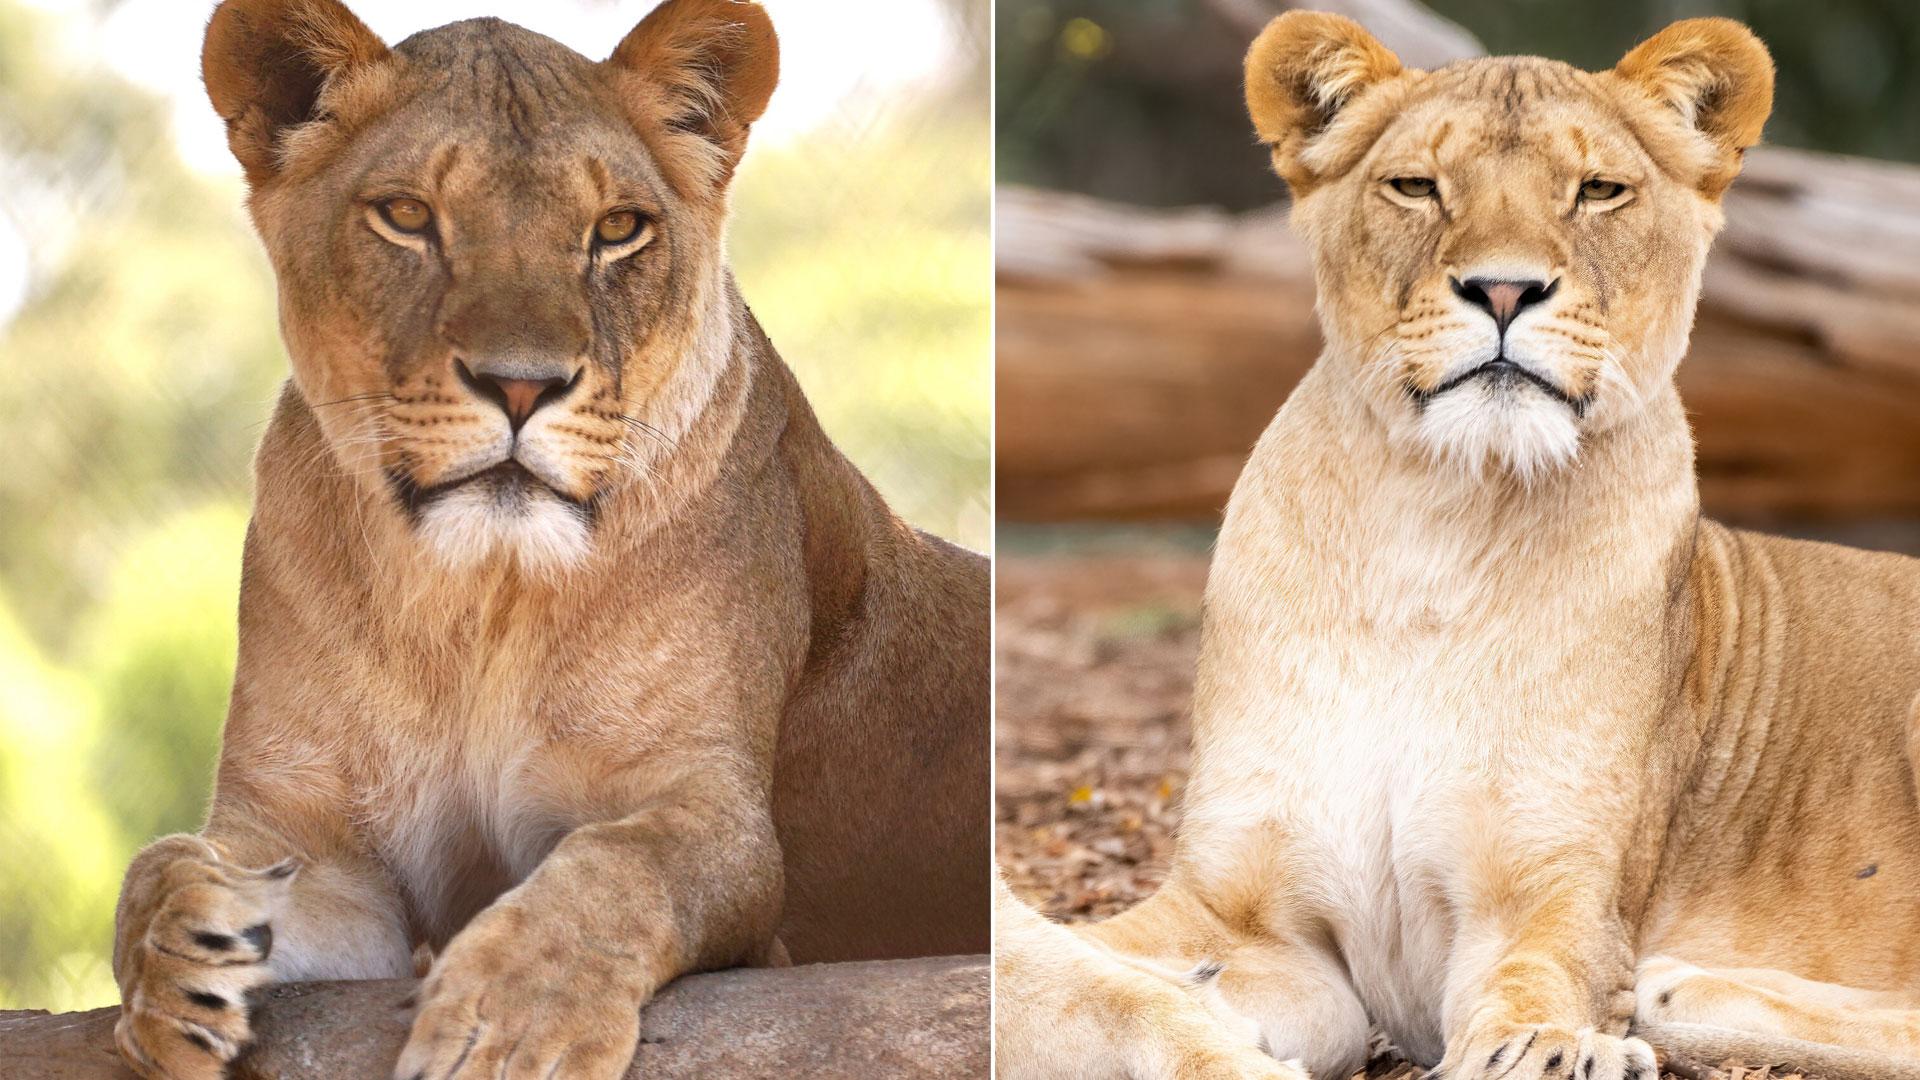 https://rfacdn.nz/zoo/assets/media/lioness-iiola-gallery-2.jpg